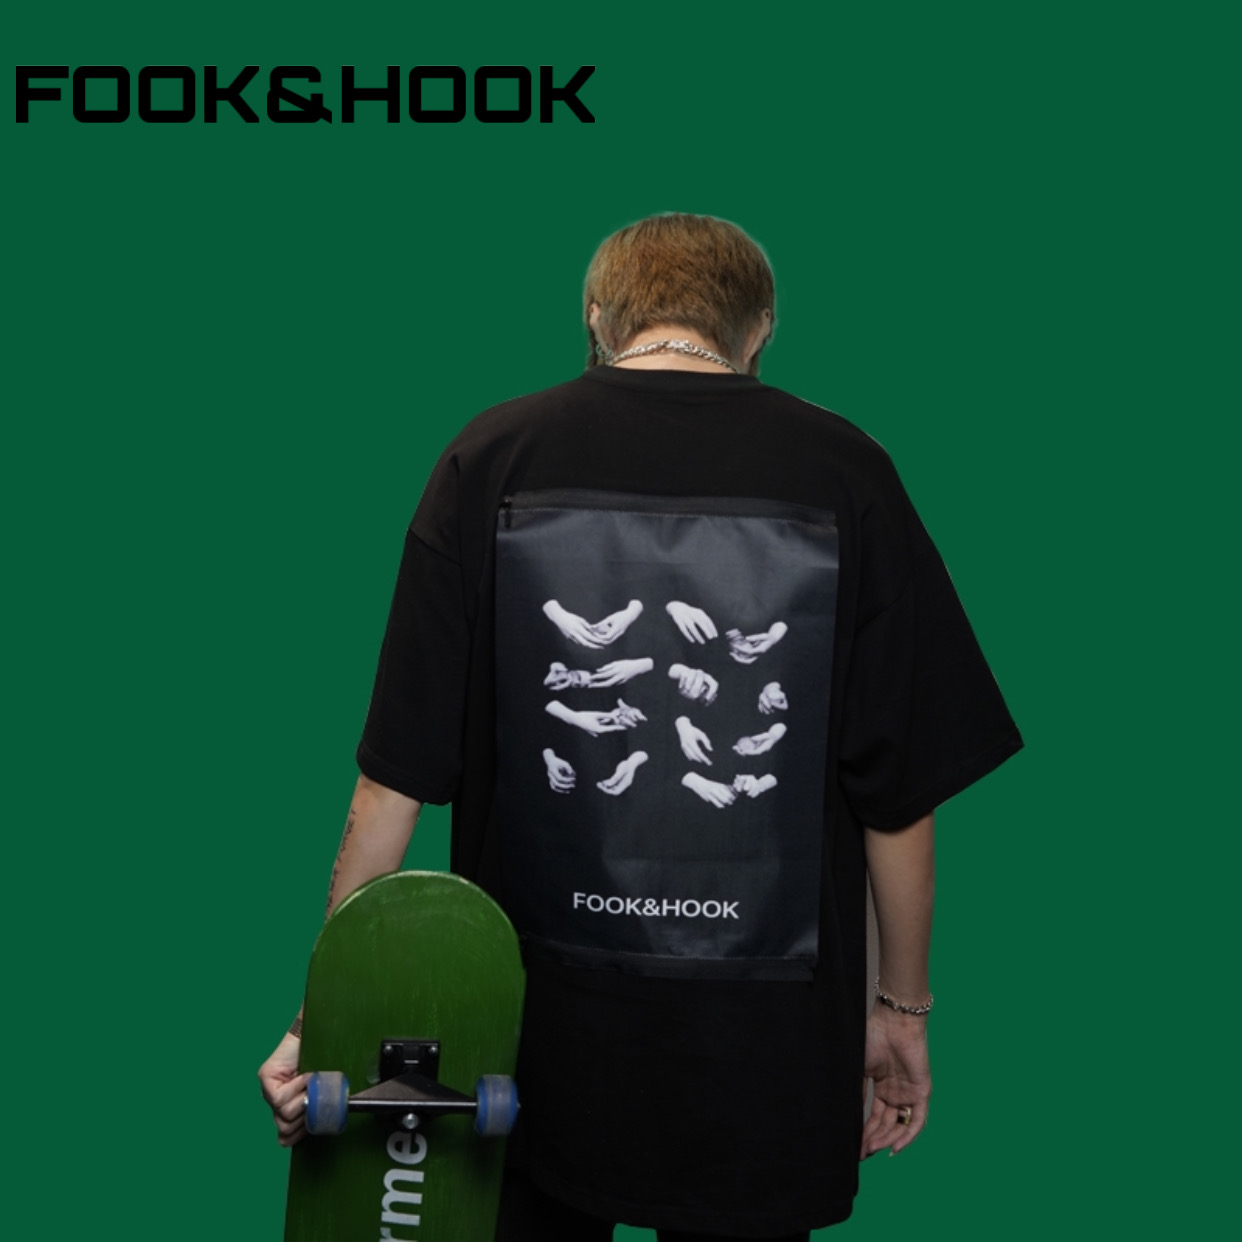 【FH】FOOK&HOOK国朝オリジナルデザイナーブランドは春夏手と薬箱Tシャツ半袖を自由に交換します。